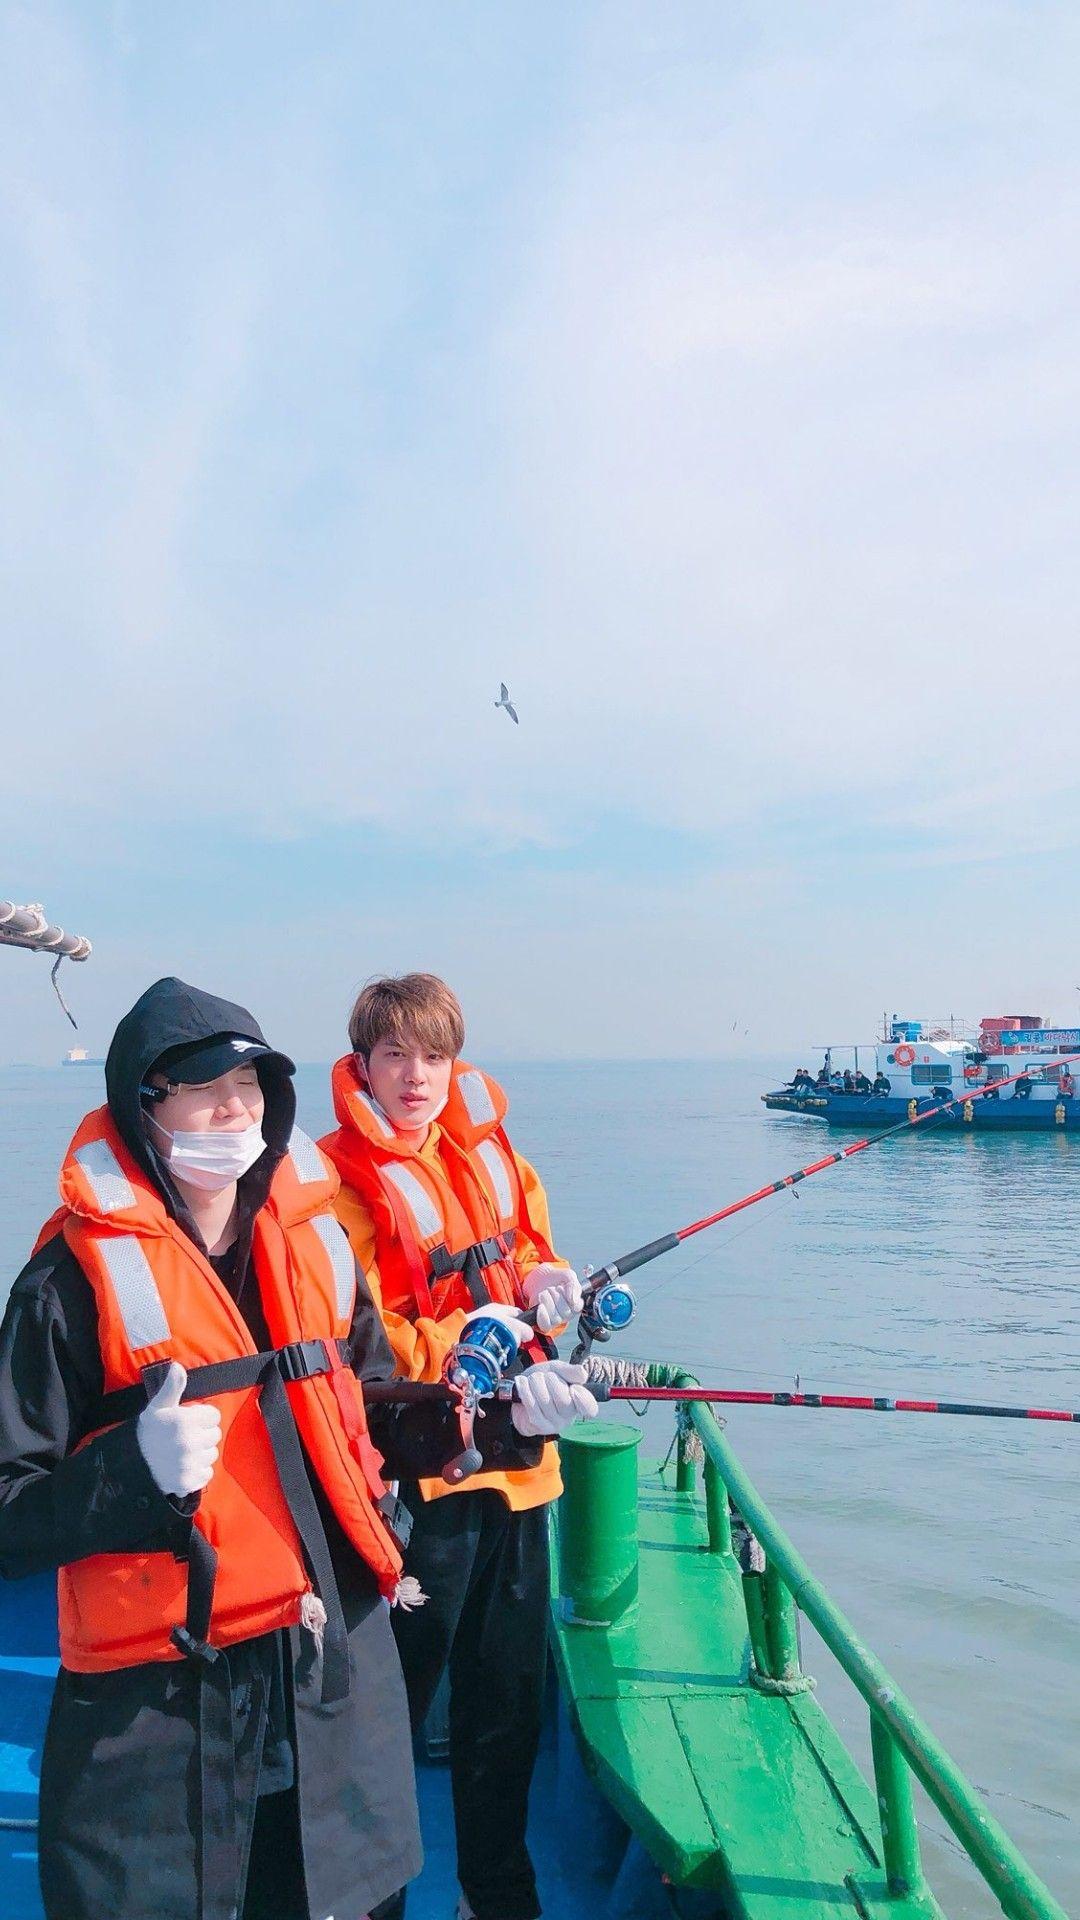 Sin Sujin Yoonjin Suga Seokjin Fishing Hd Lockscreen Wallpaper Cute Bts Seokjin Bts Bts Pictures Bts Photo